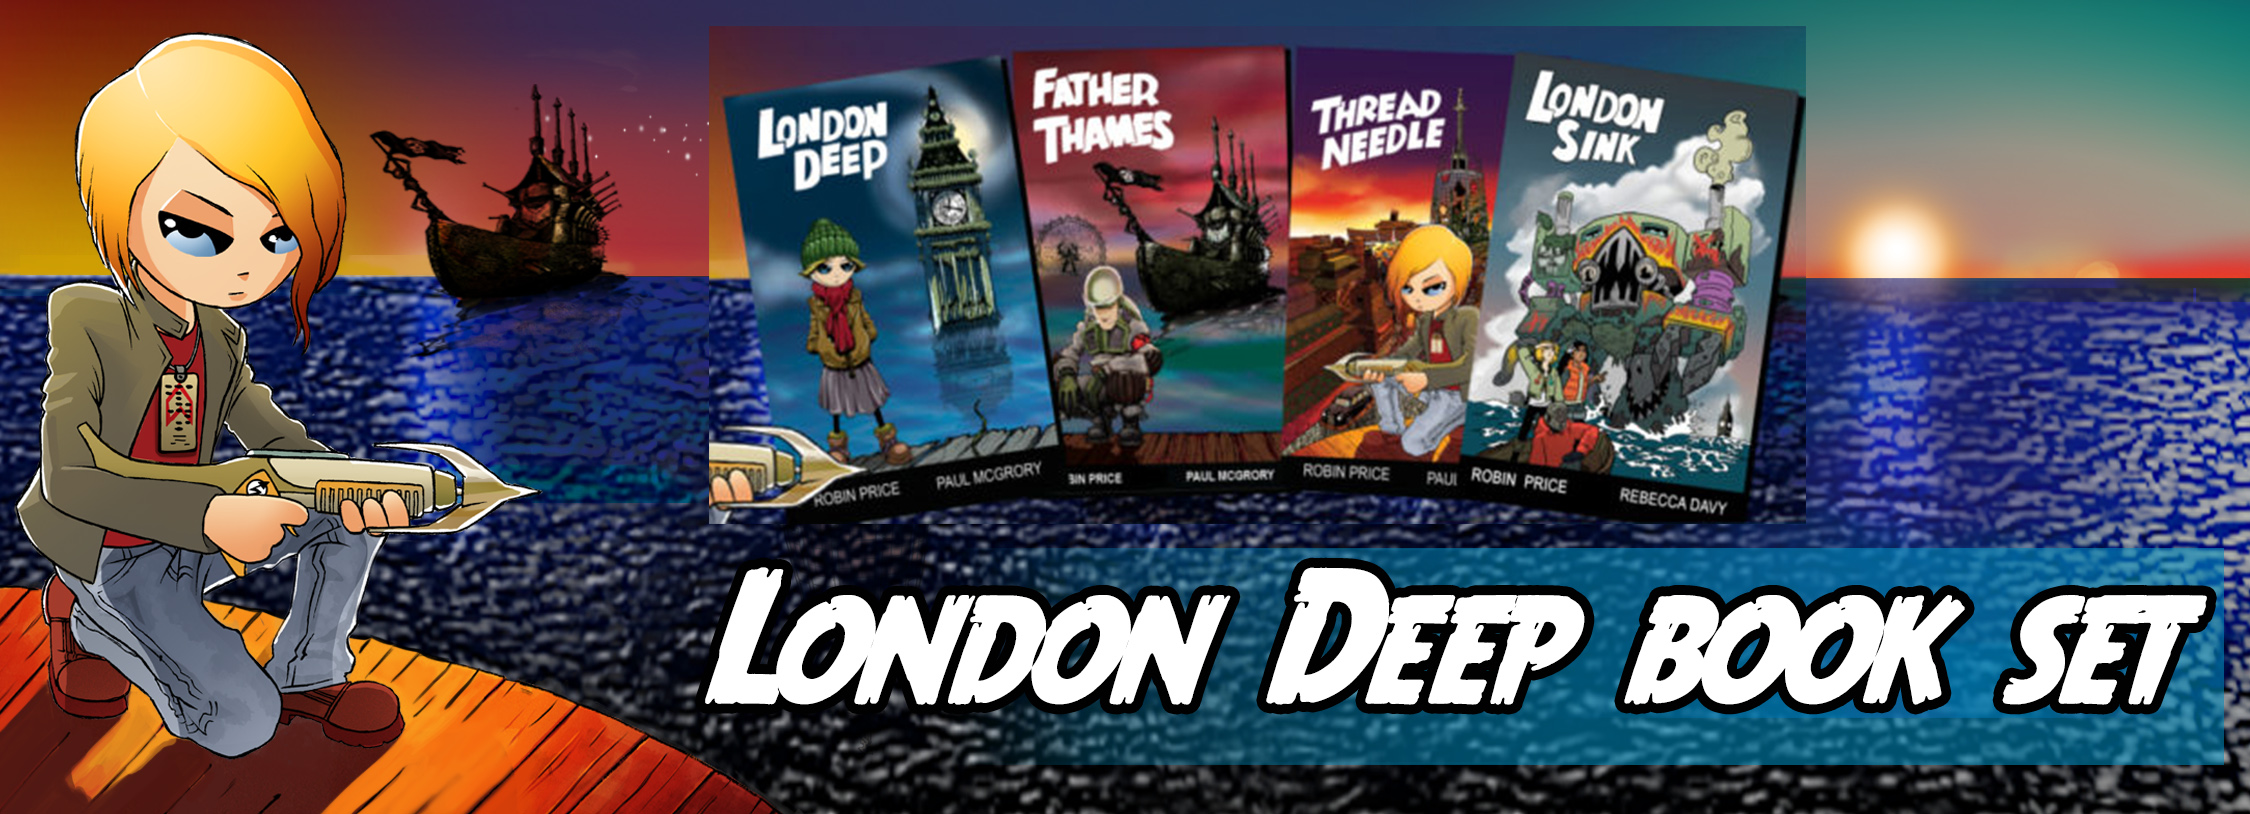 London Deep book set